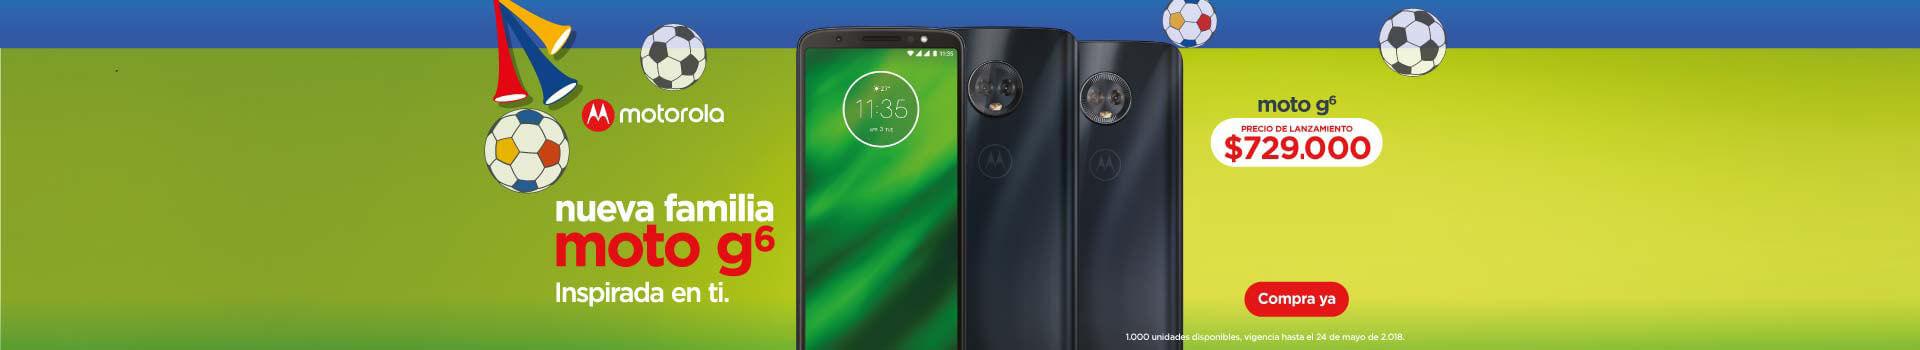 AK-KT-BCAT-2-celulares-LNZ---Motorola-MotoG6-May21